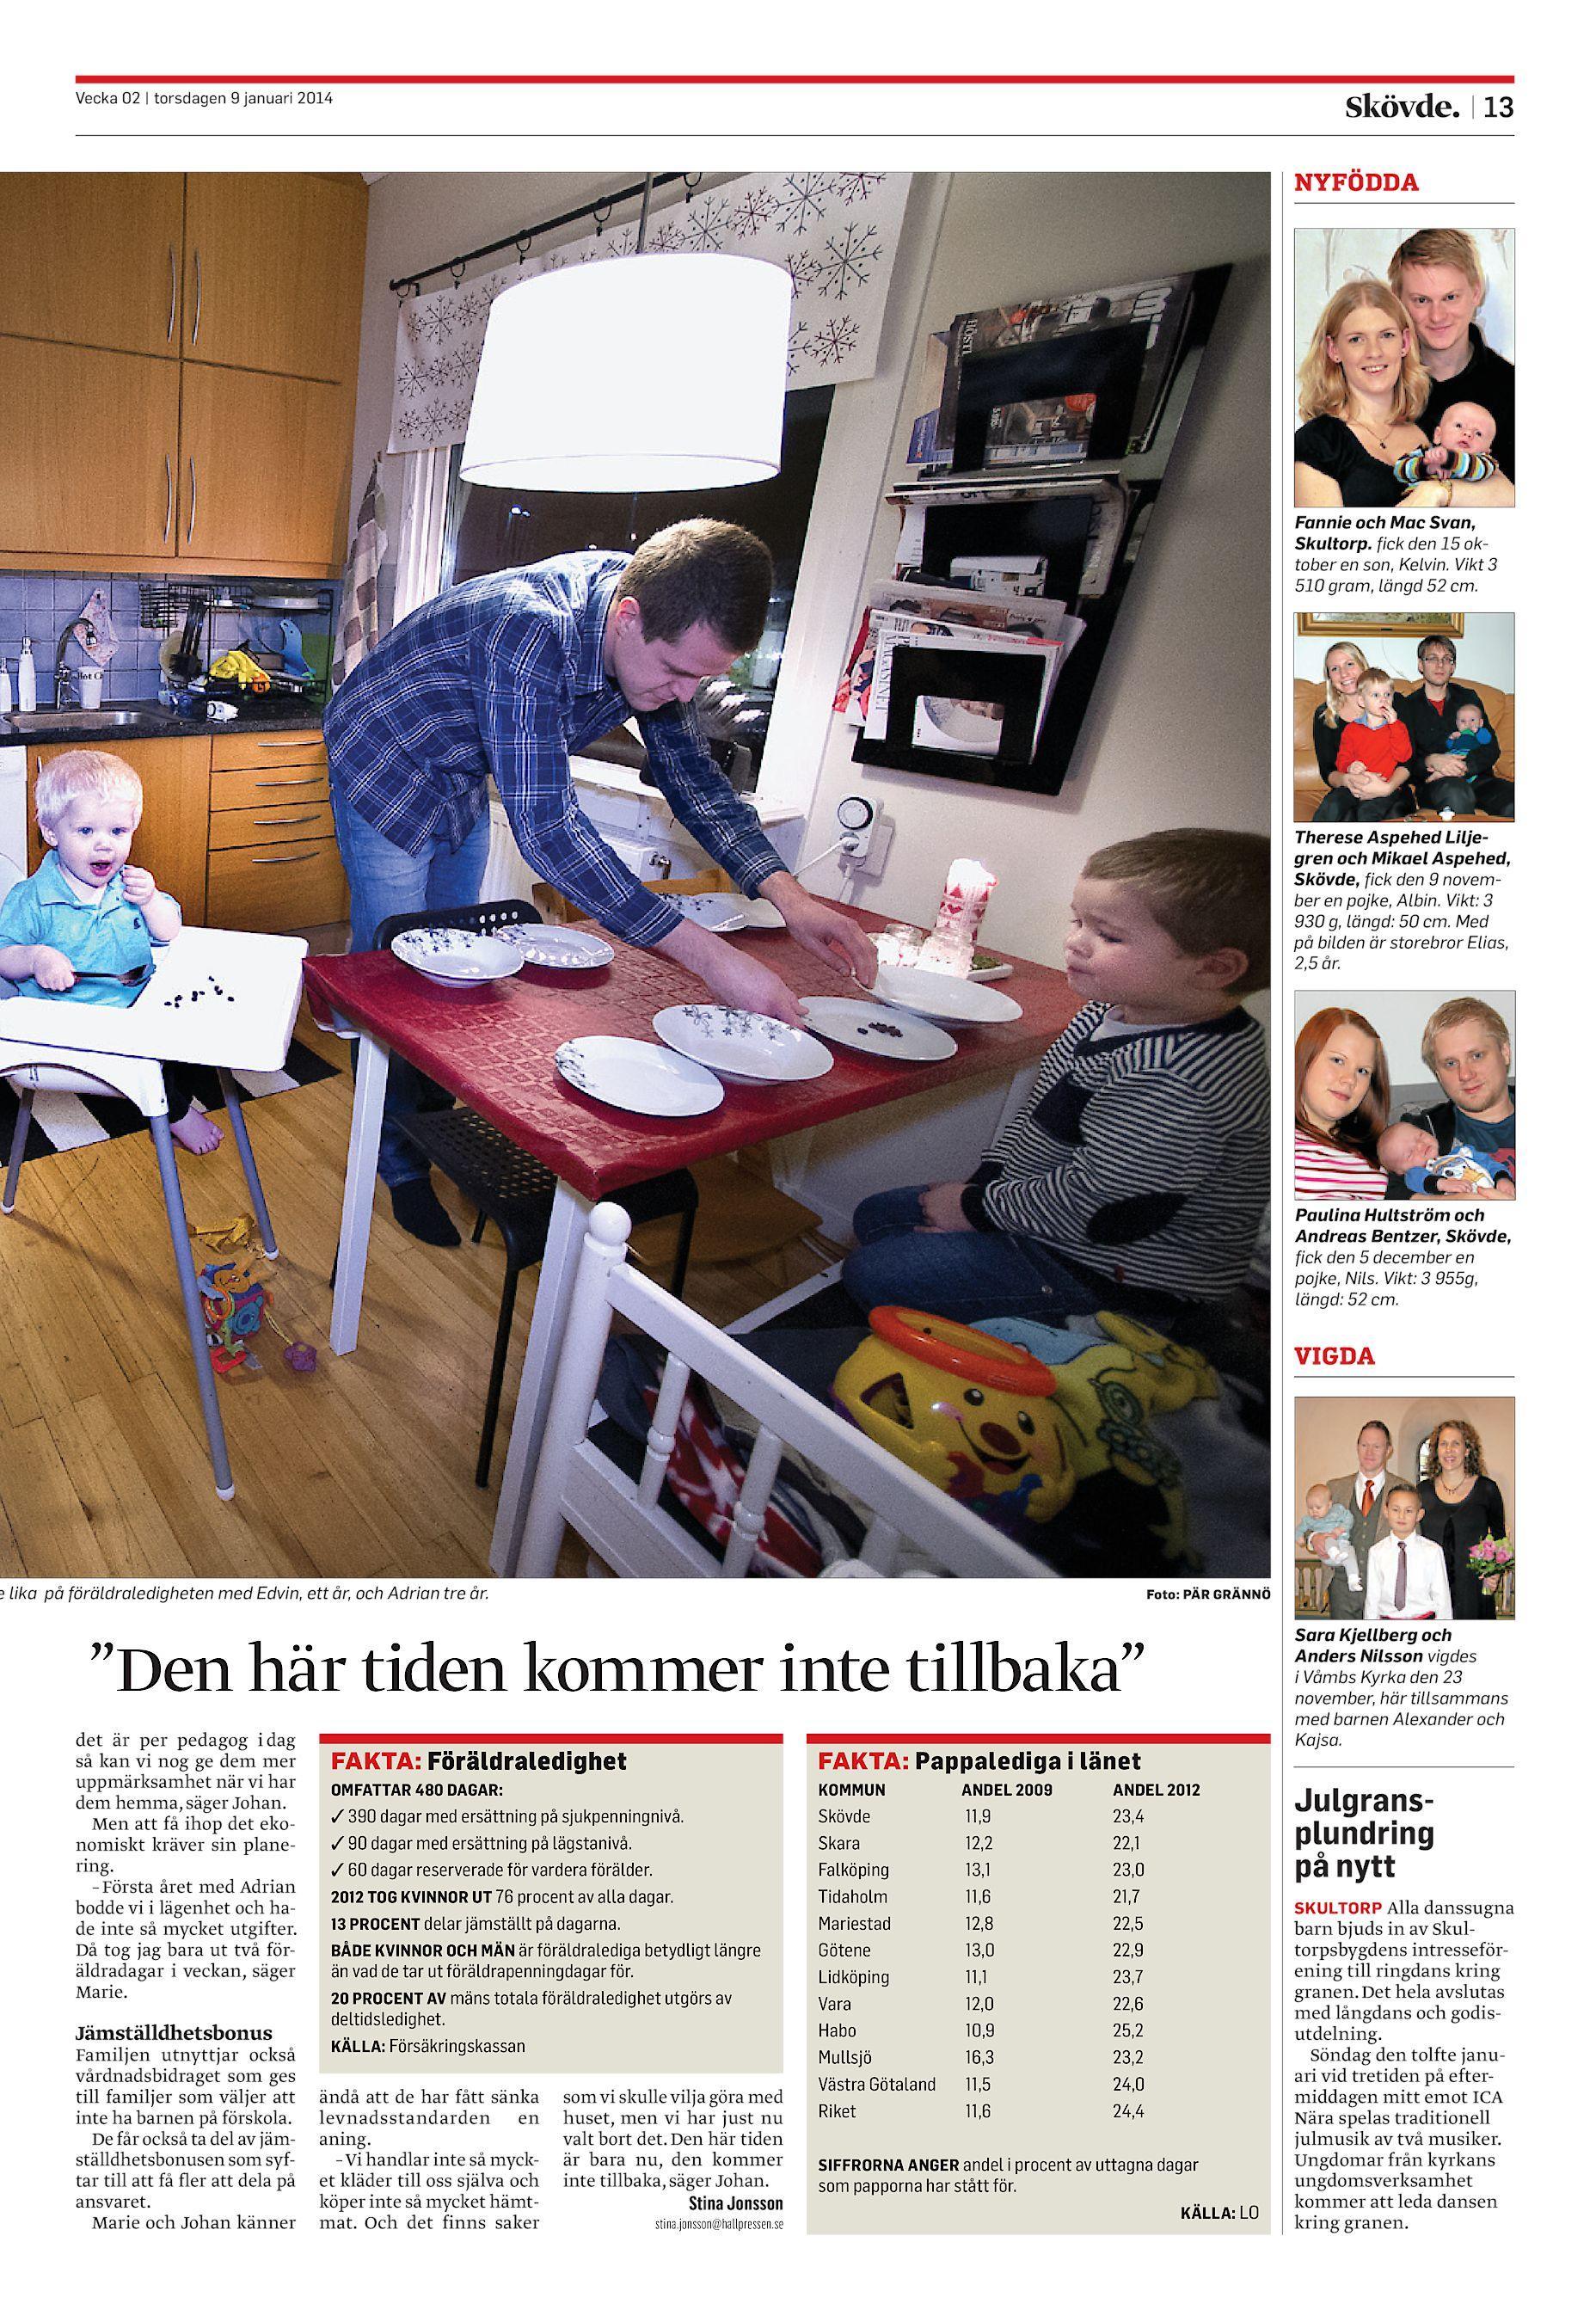 Skövde Nyheter SN-20140109 (endast text) ec19f30db3b6e